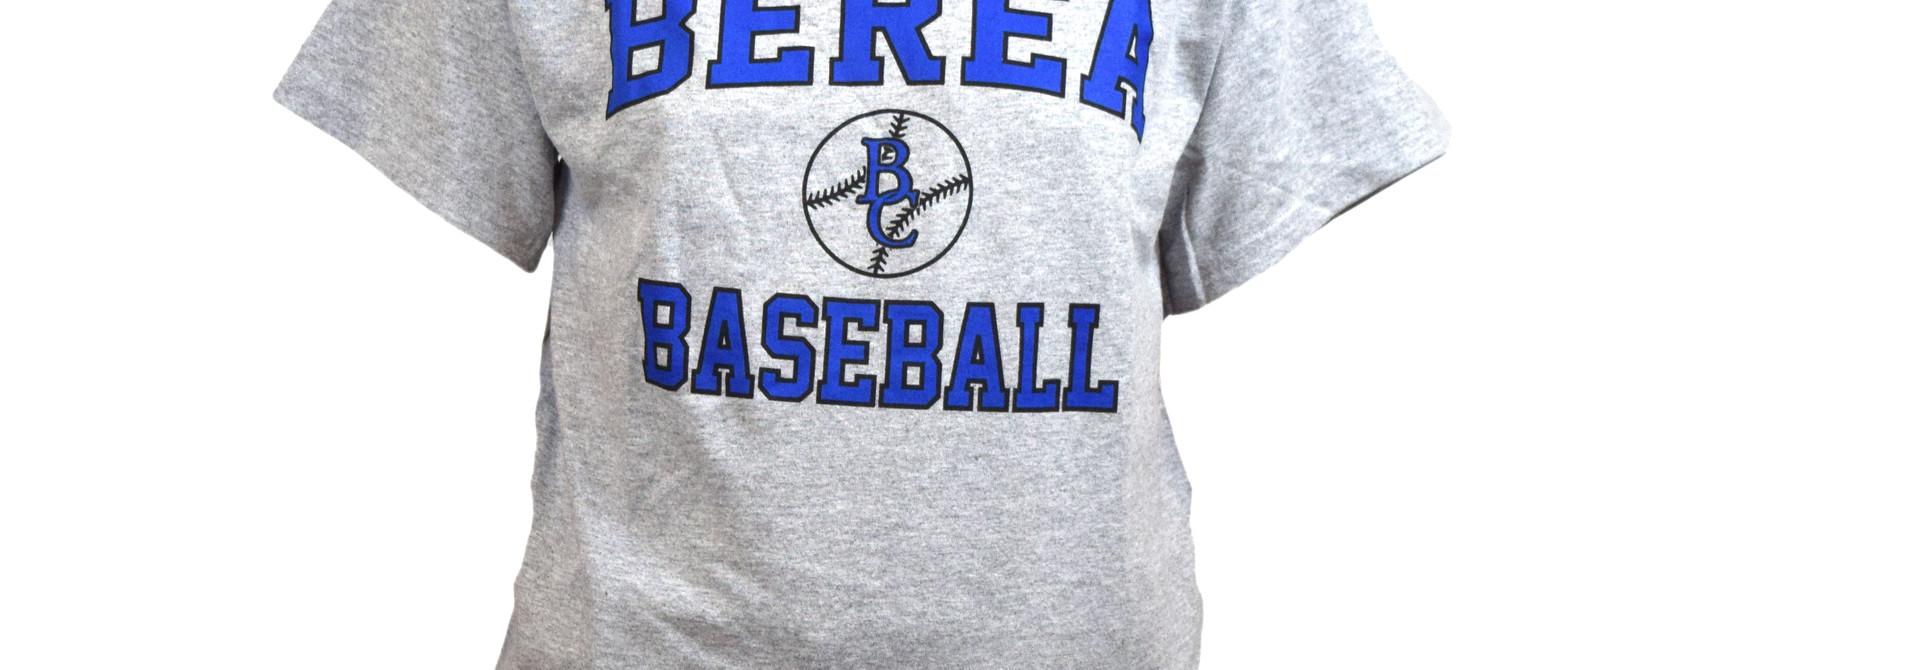 Gray Sports T-shirt